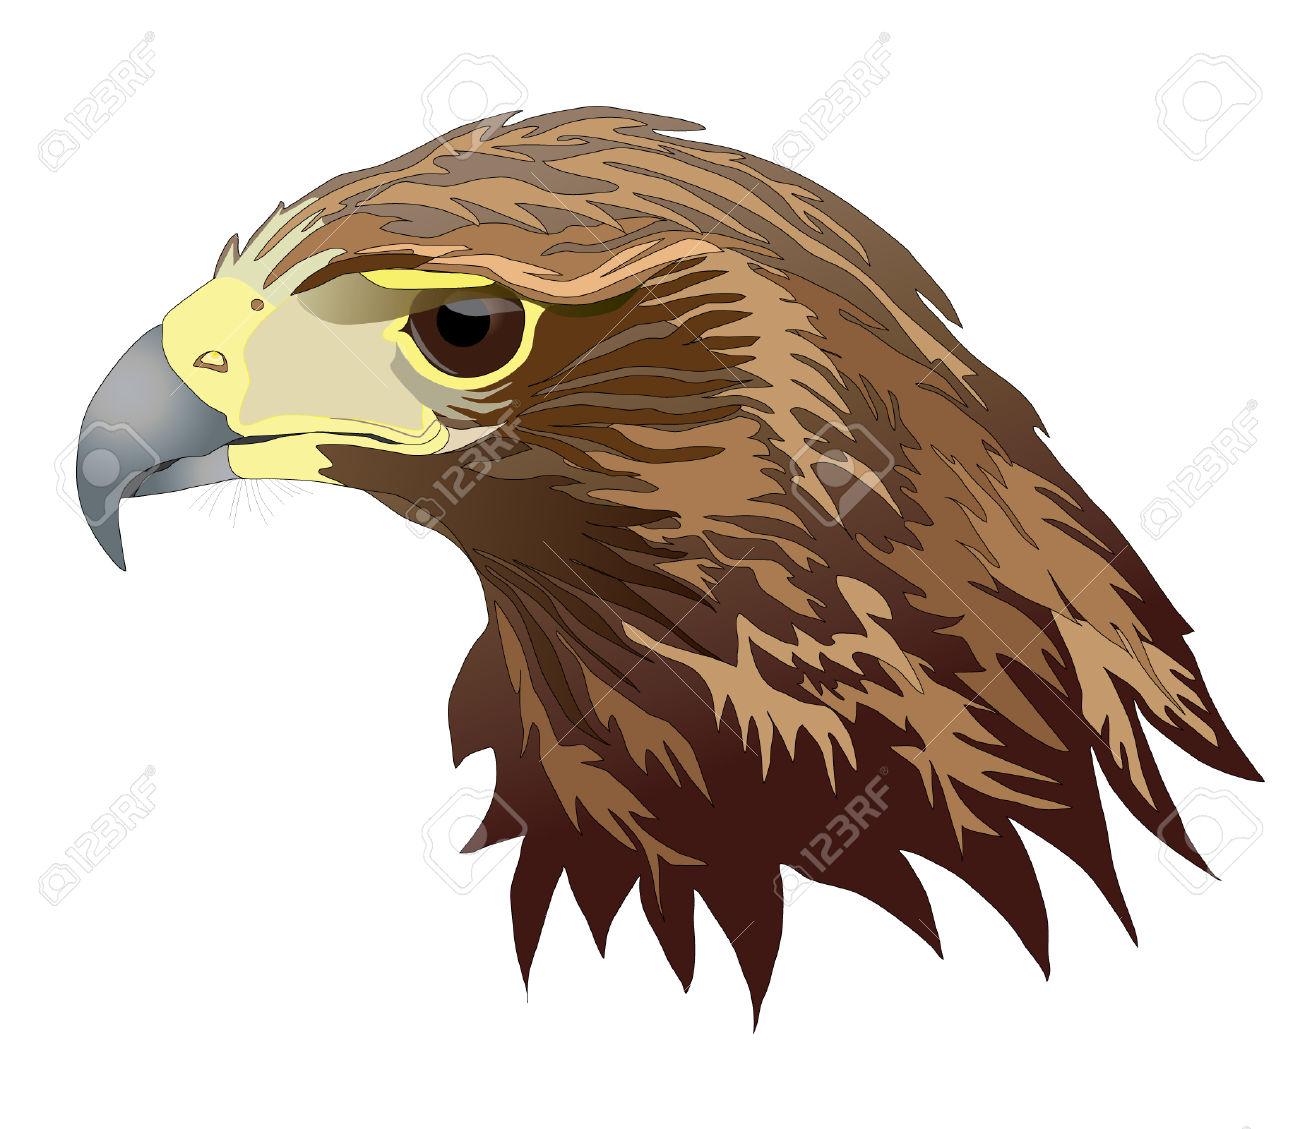 Harris Hawk Head Royalty Free Cliparts, Vectors, And Stock.